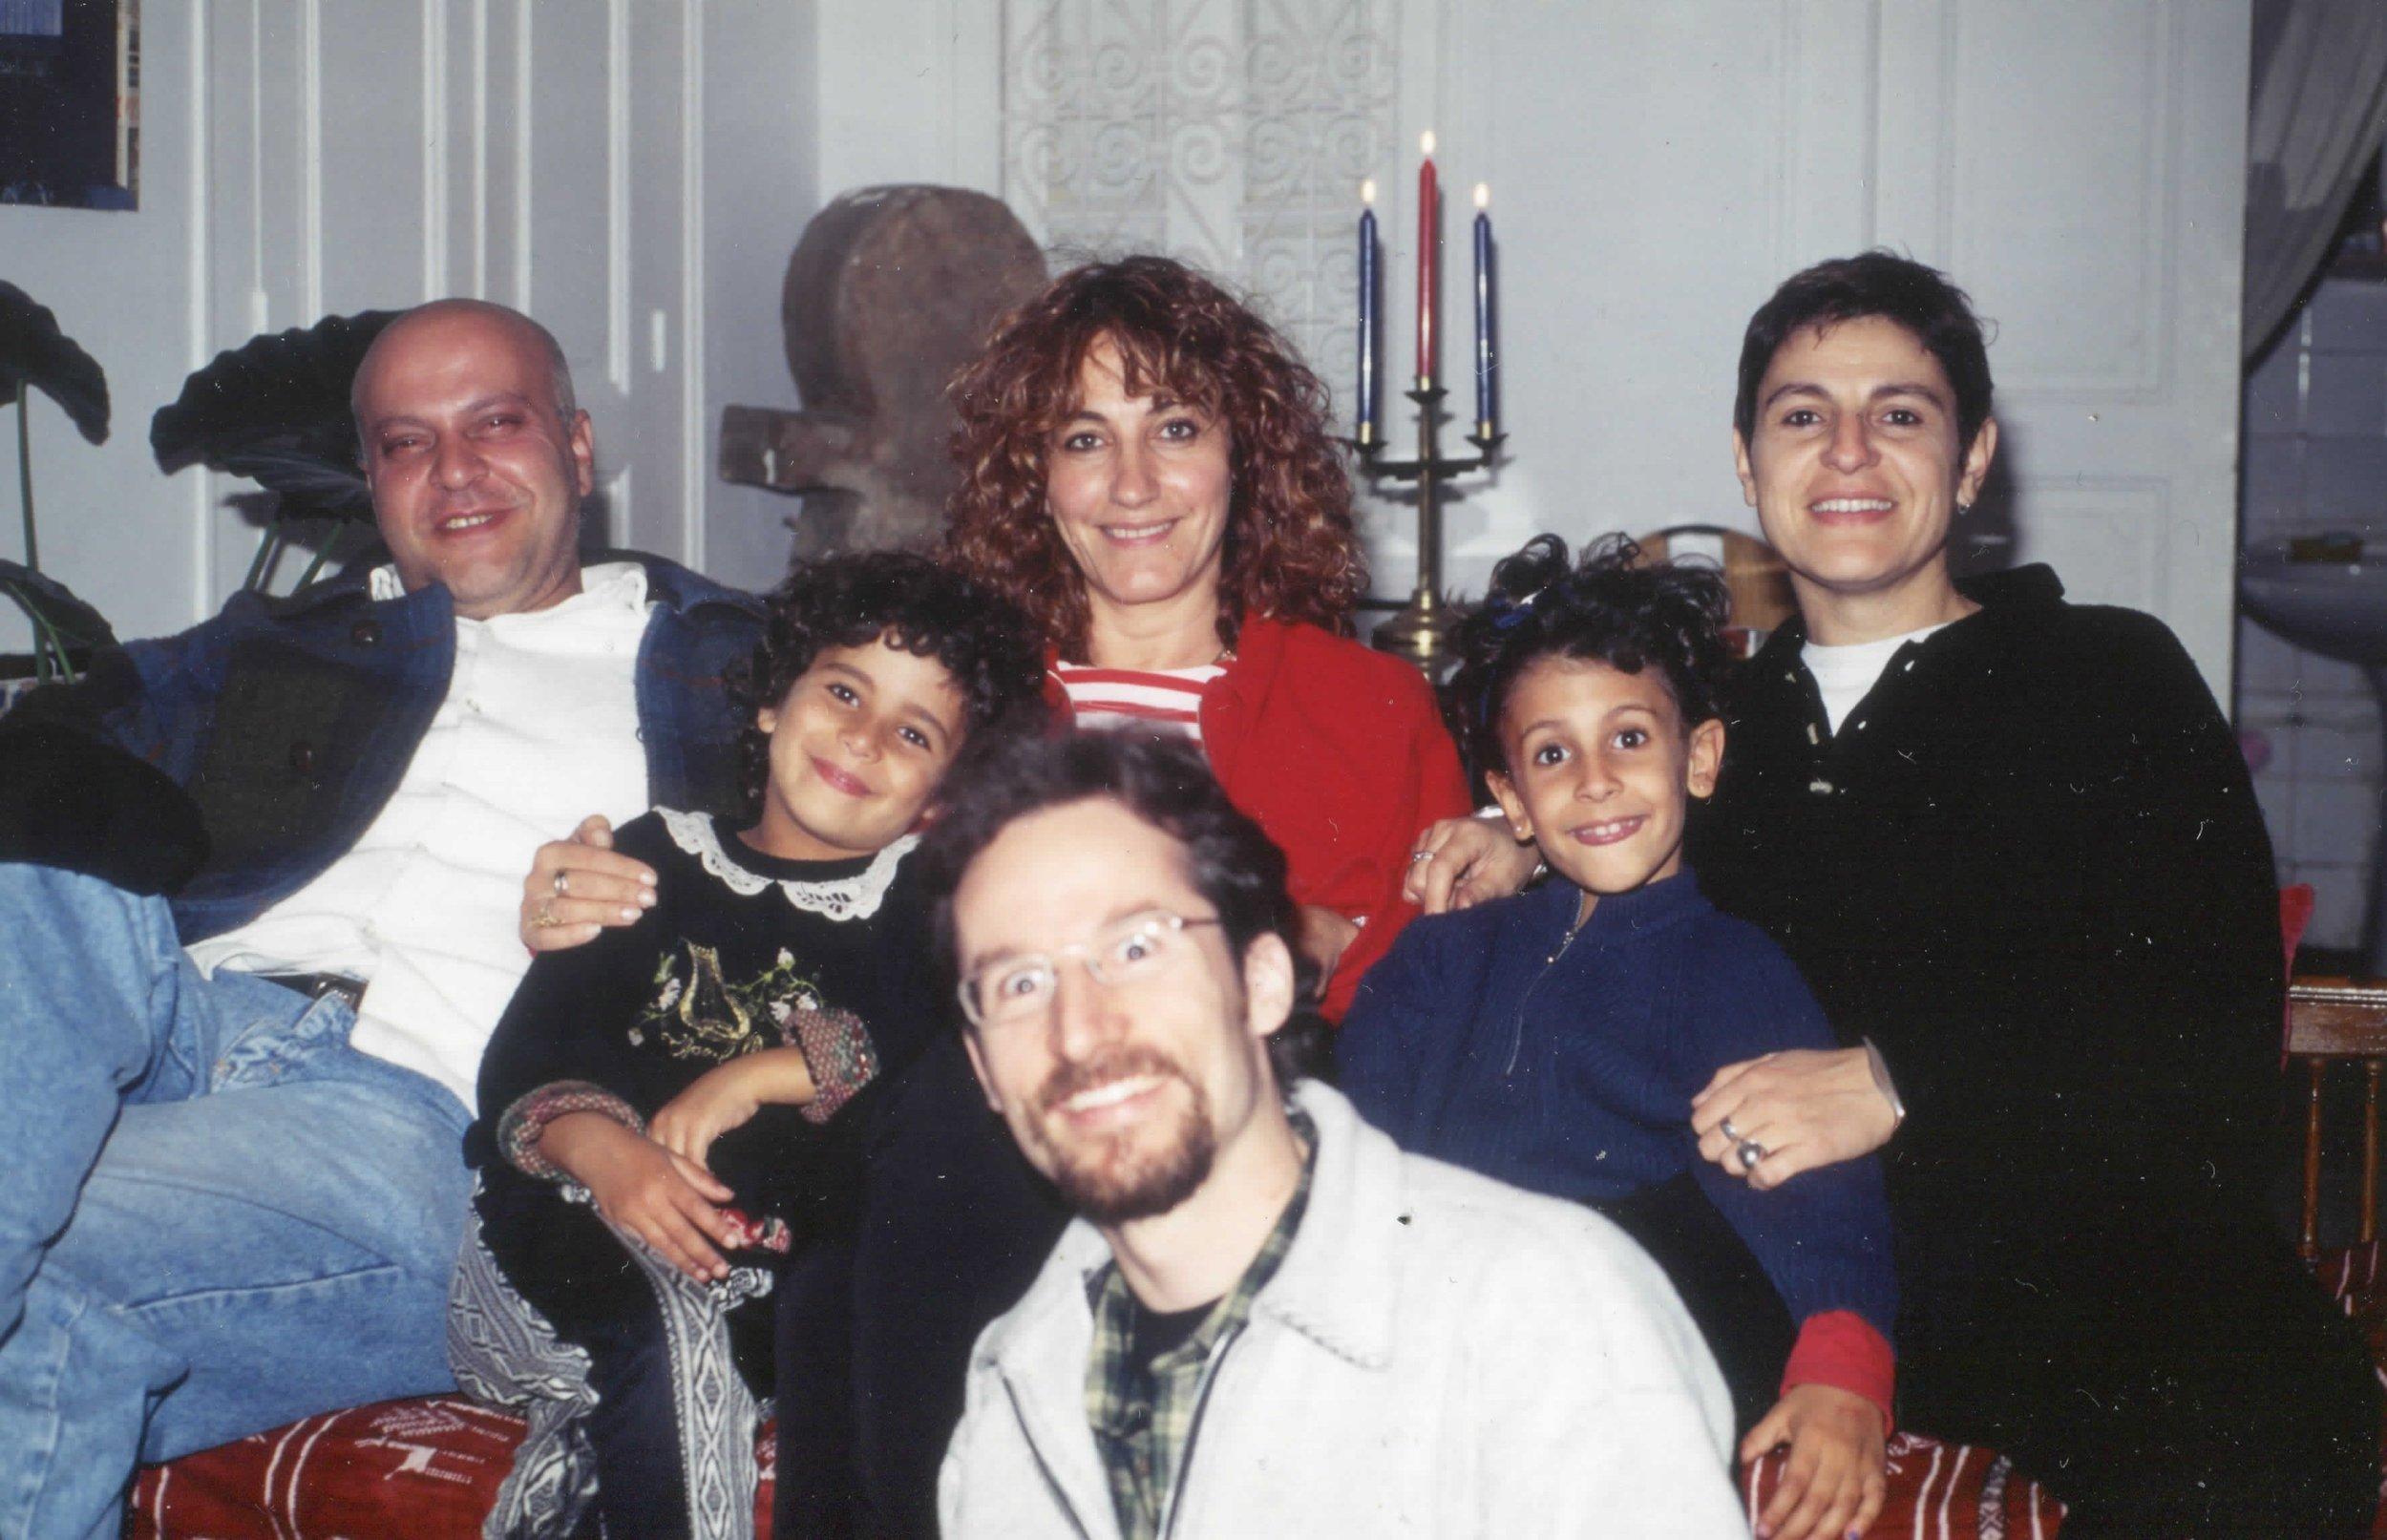 Escargot Tunisia Team and Family.jpg